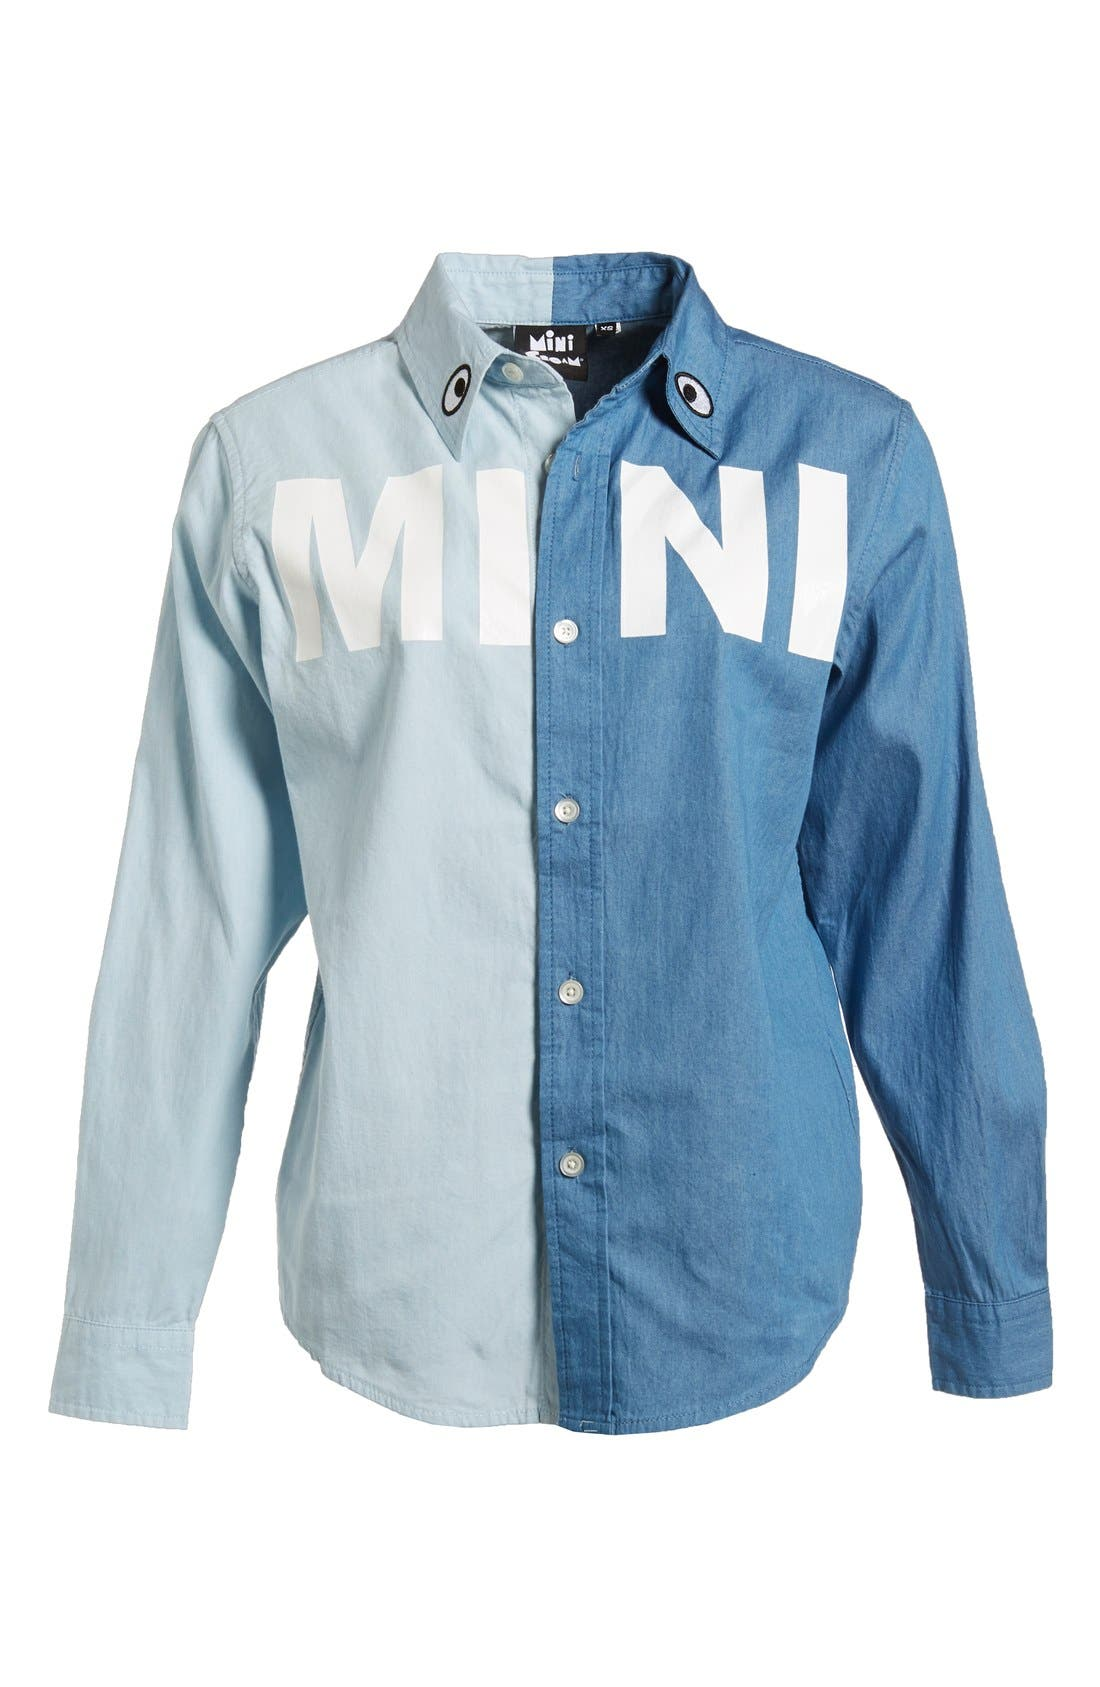 Alternate Image 1 Selected - Mini Cream 'Mini Wish' Two-Tone Chambray Shirt (Women)